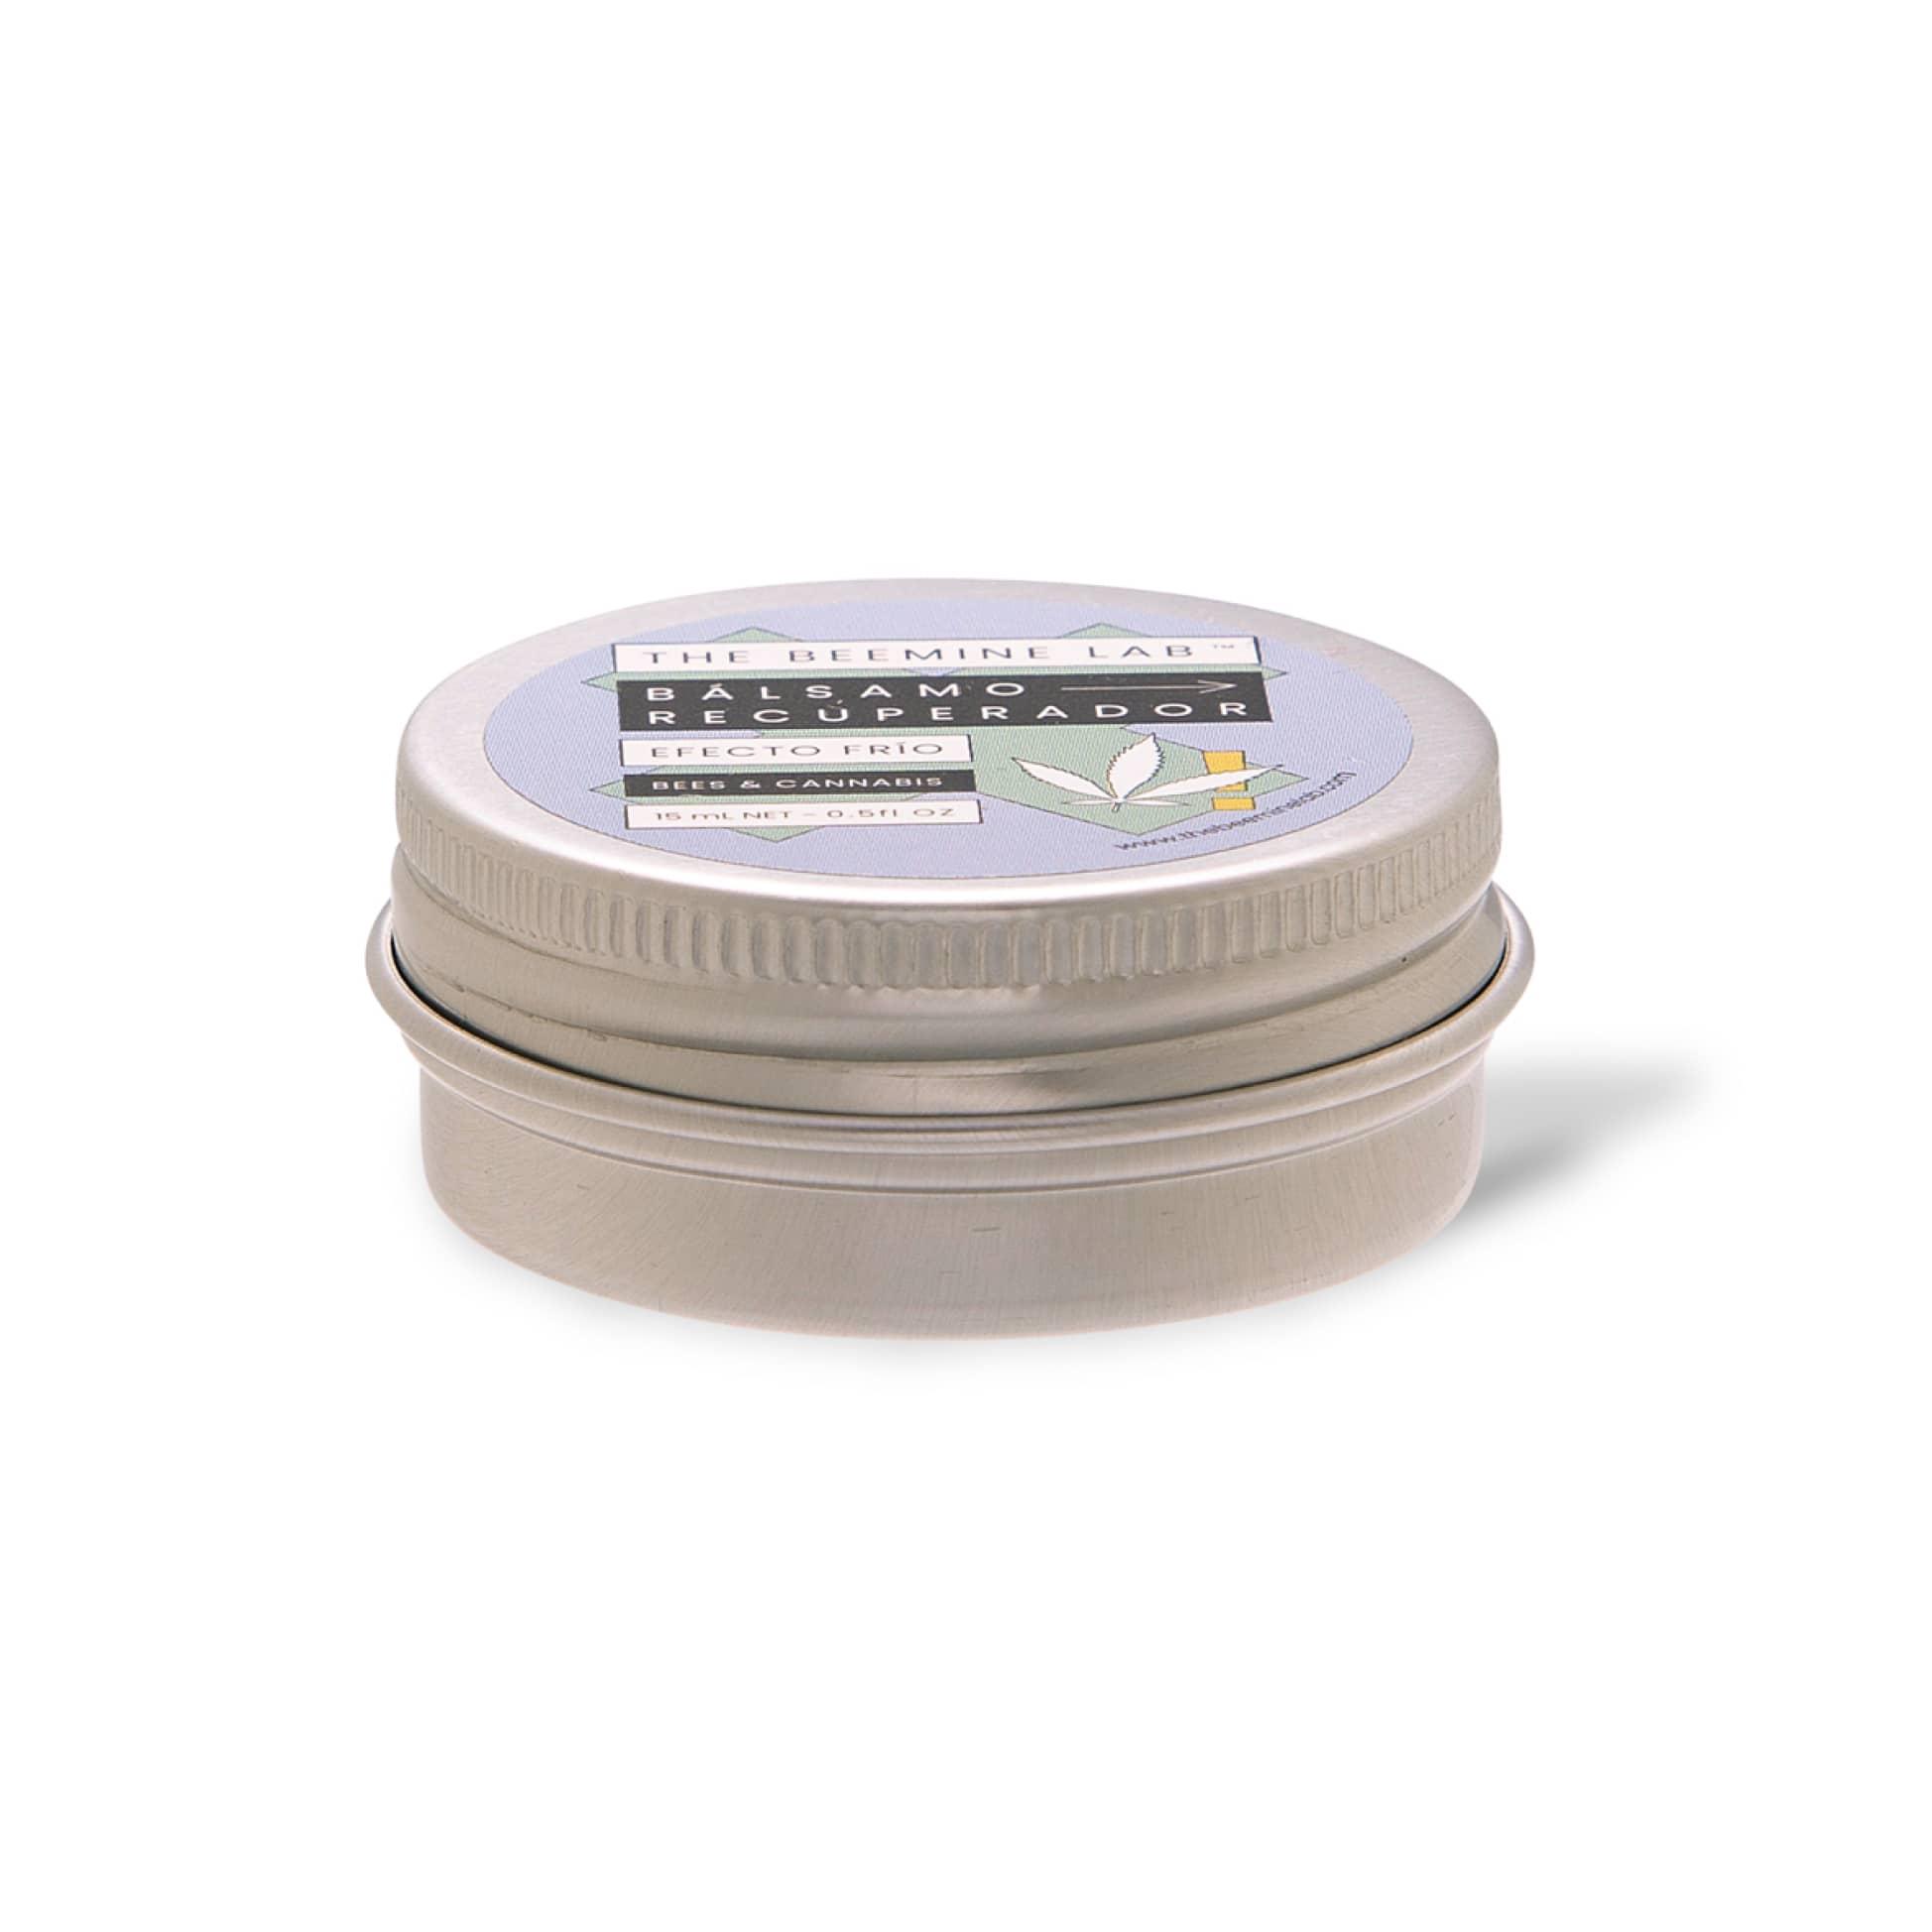 Balsamo de Emergencia CBD 15ml 2-min